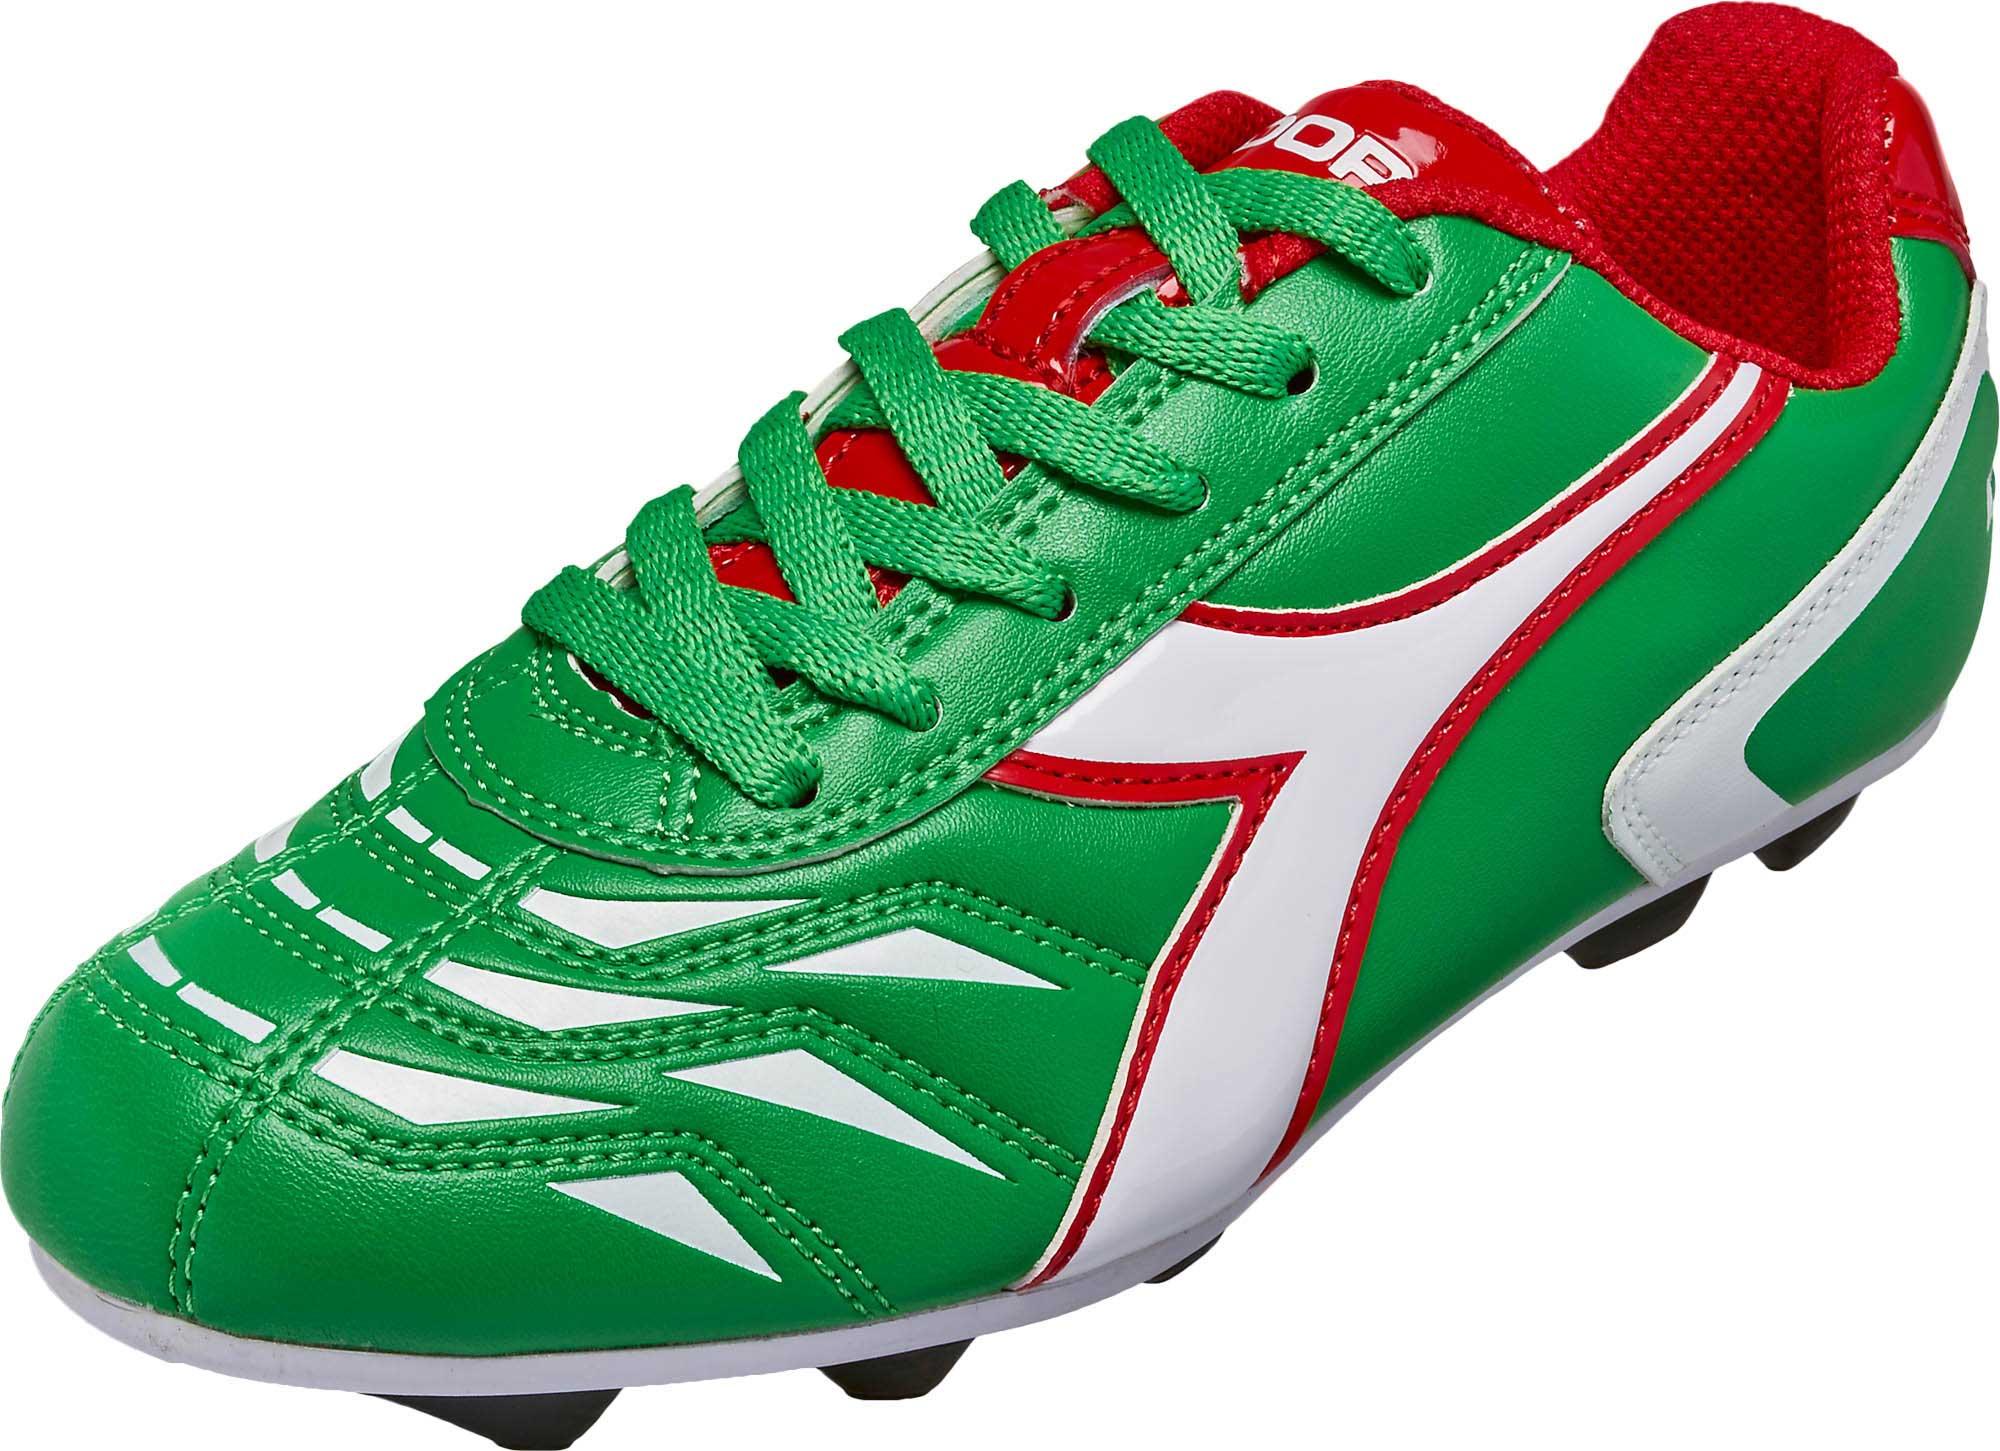 85e552c18c09 Diadora Kids Capitano MD FG Soccer Cleats – Green/White